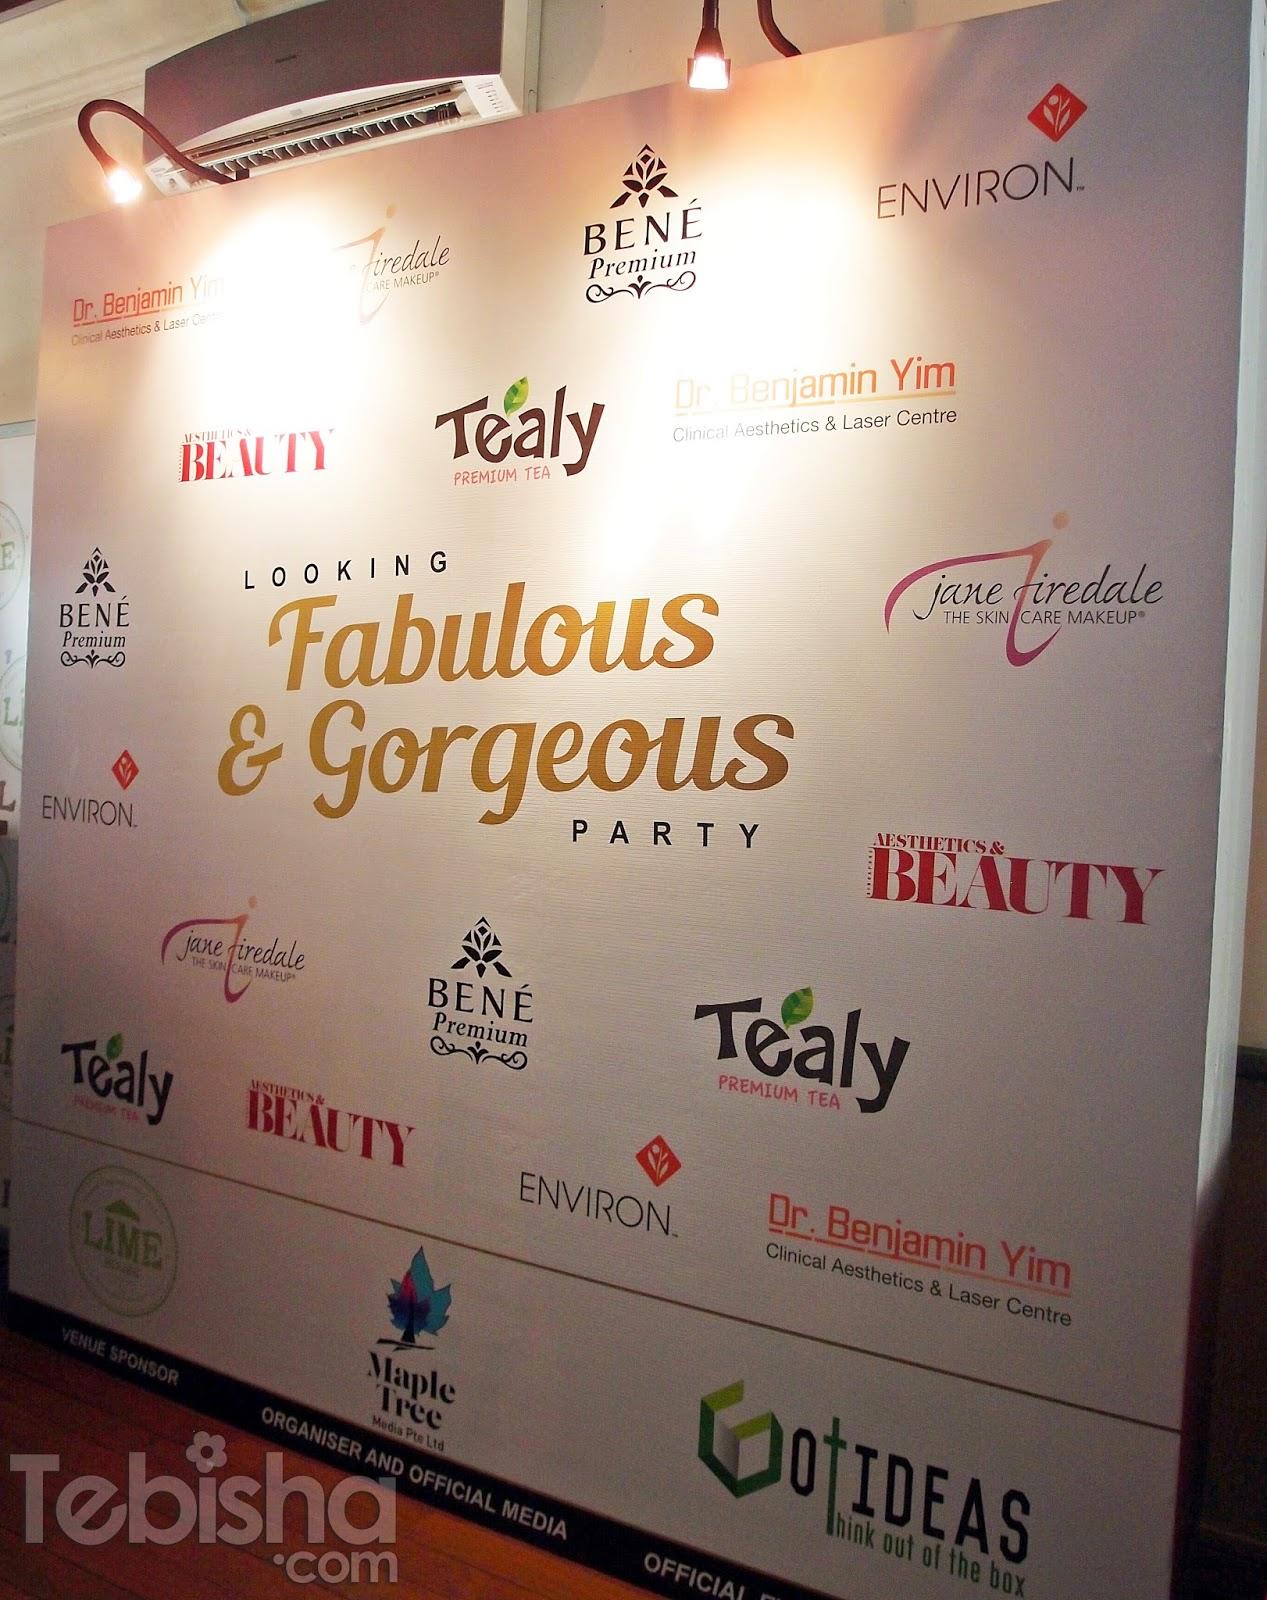 Event] Aesthetics & Beauty 'Looking Fabulous & Gorgeous